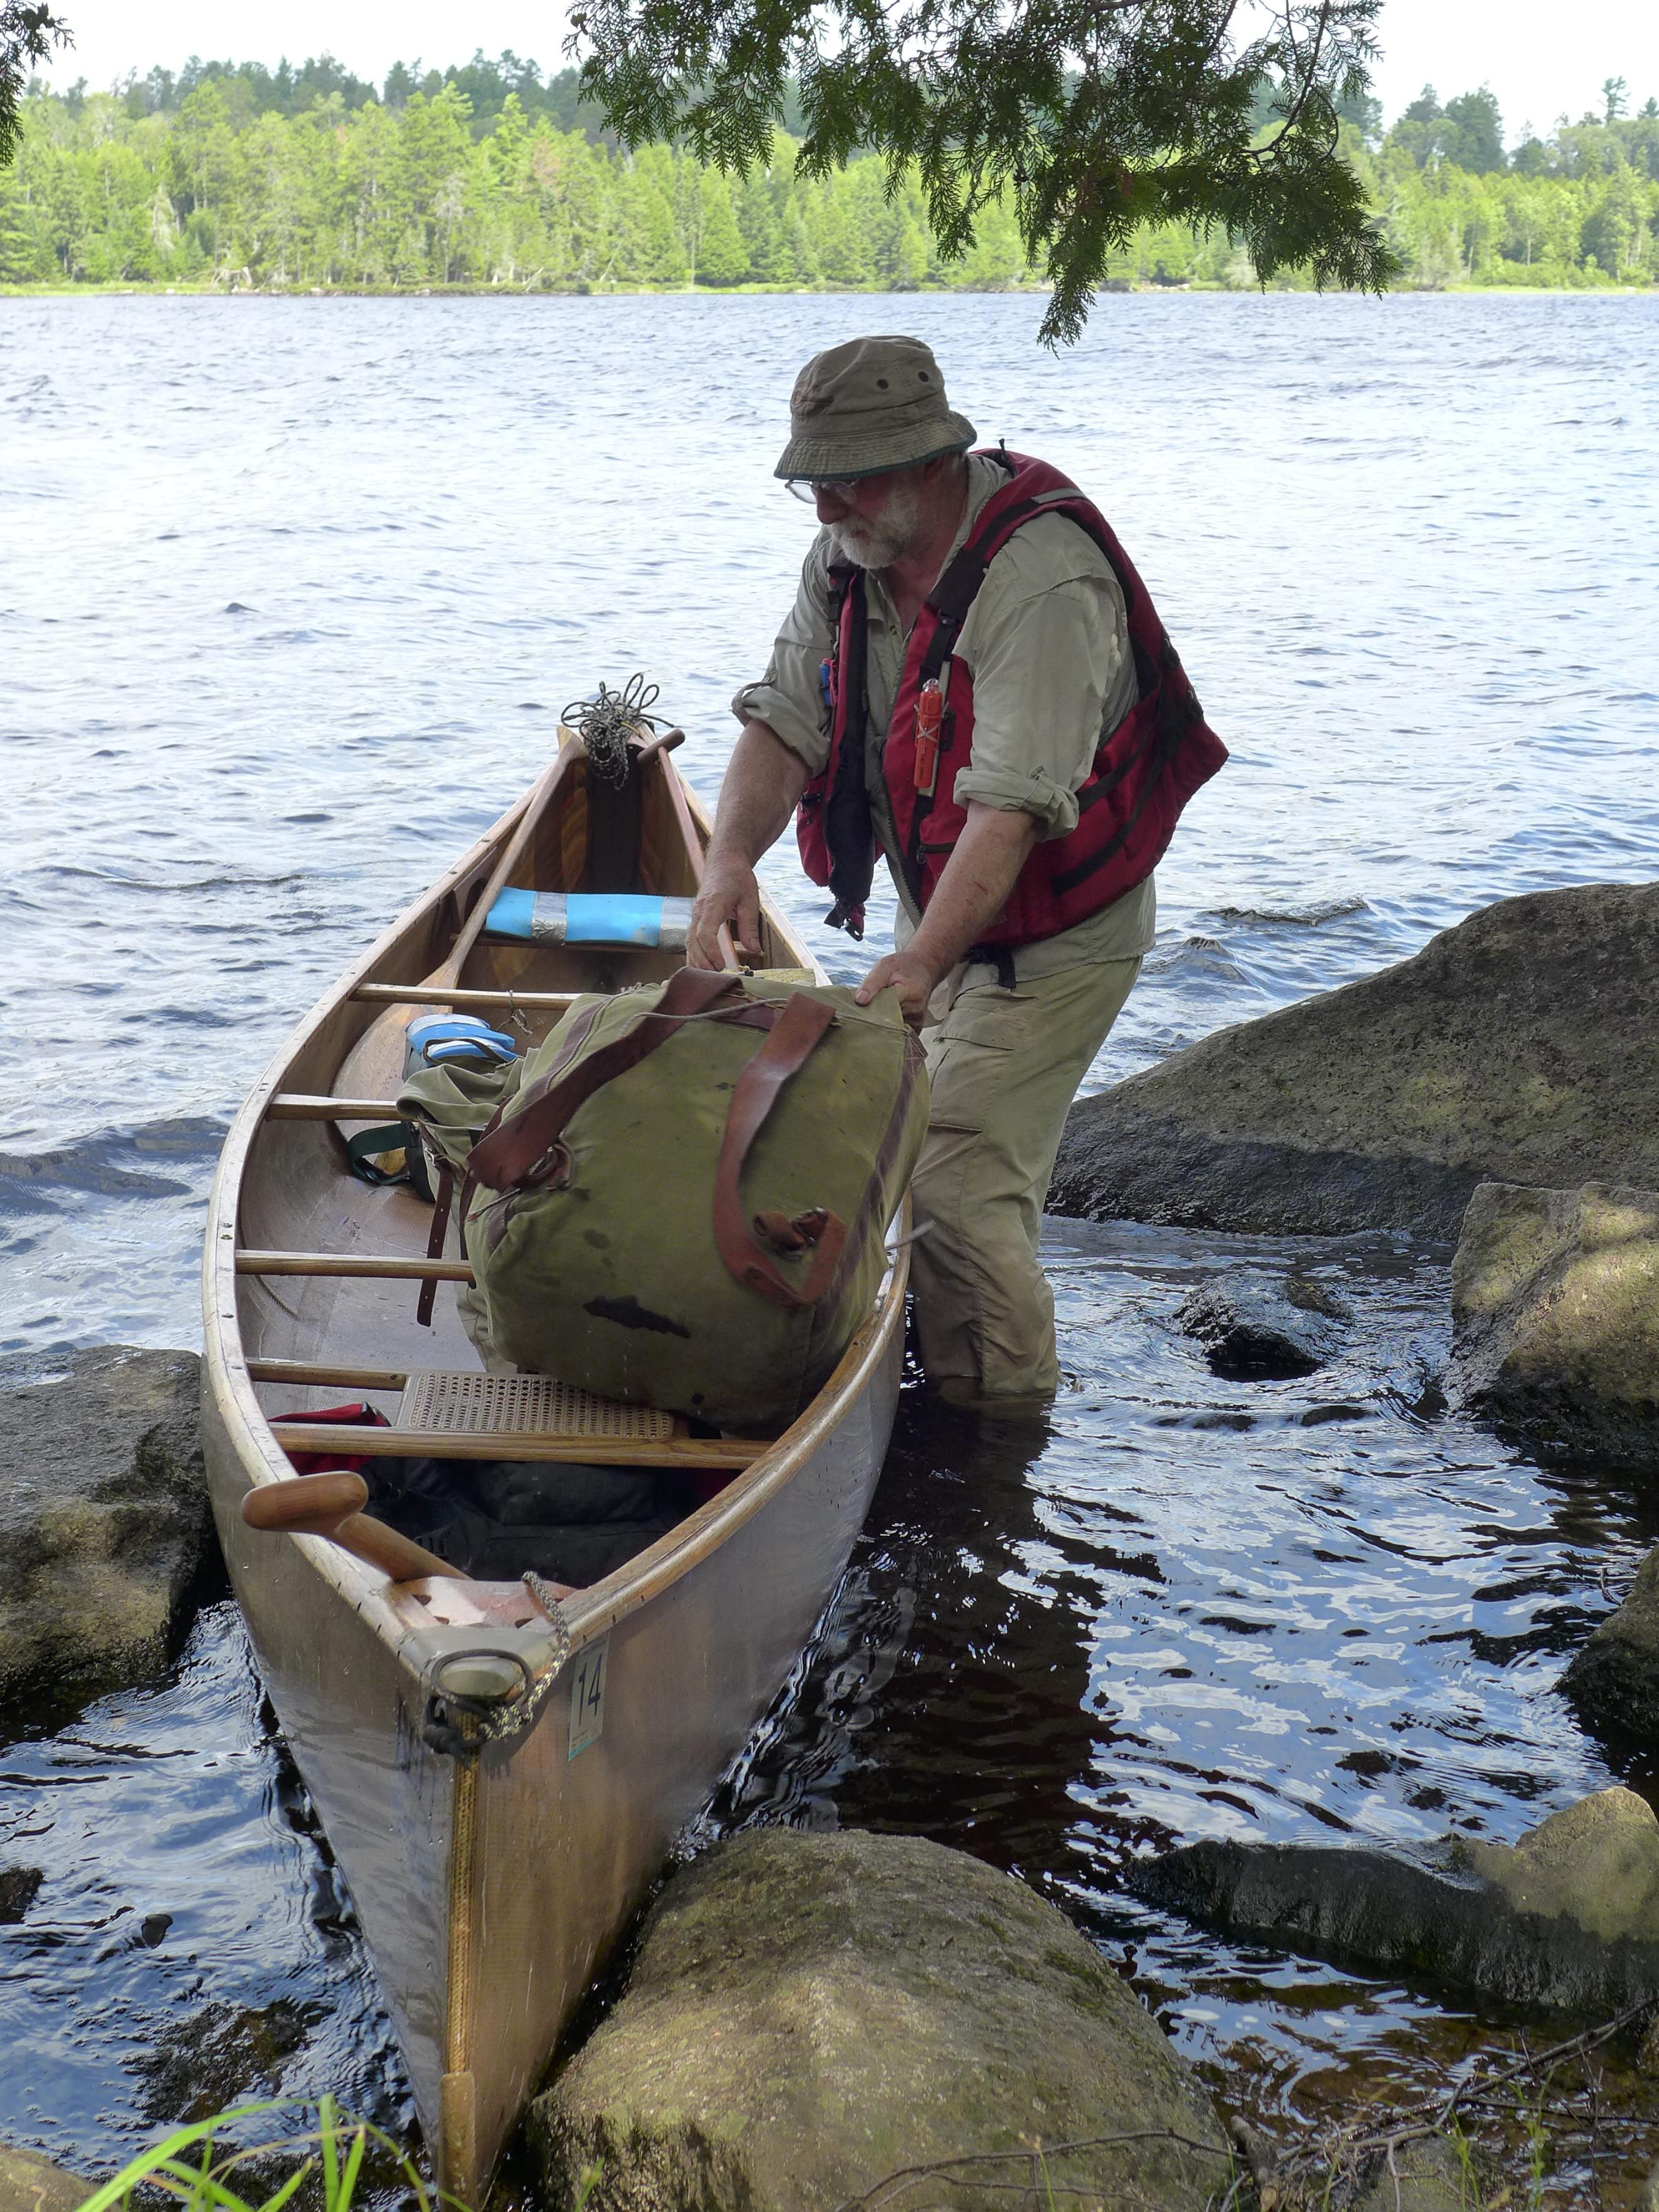 BWCA 16 foot prospector - best all purpose canoe? Boundary Waters